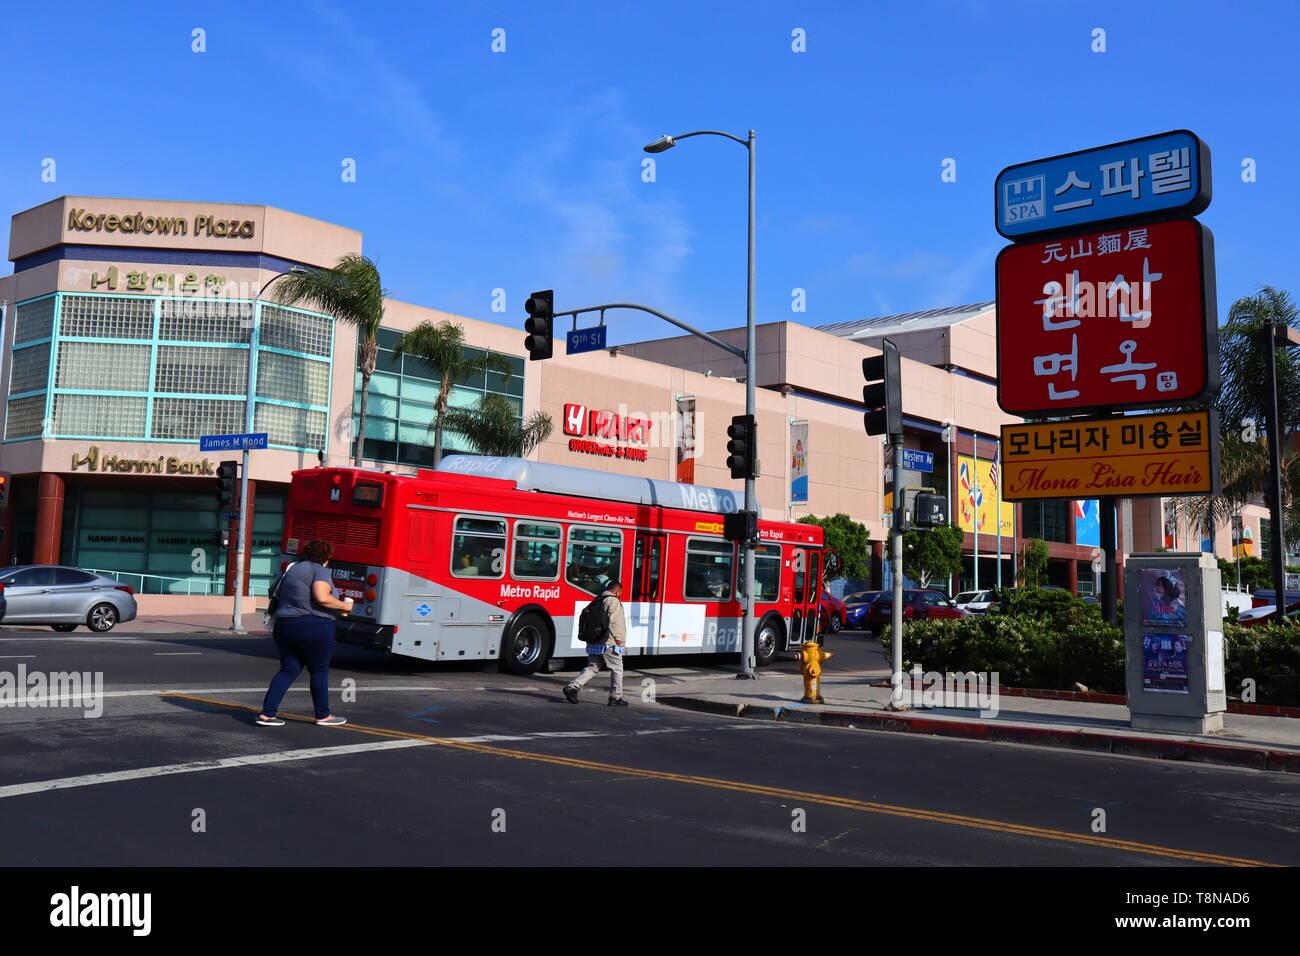 KOREATOWN a neighborhood of LOS ANGELES downtown Stock Photo